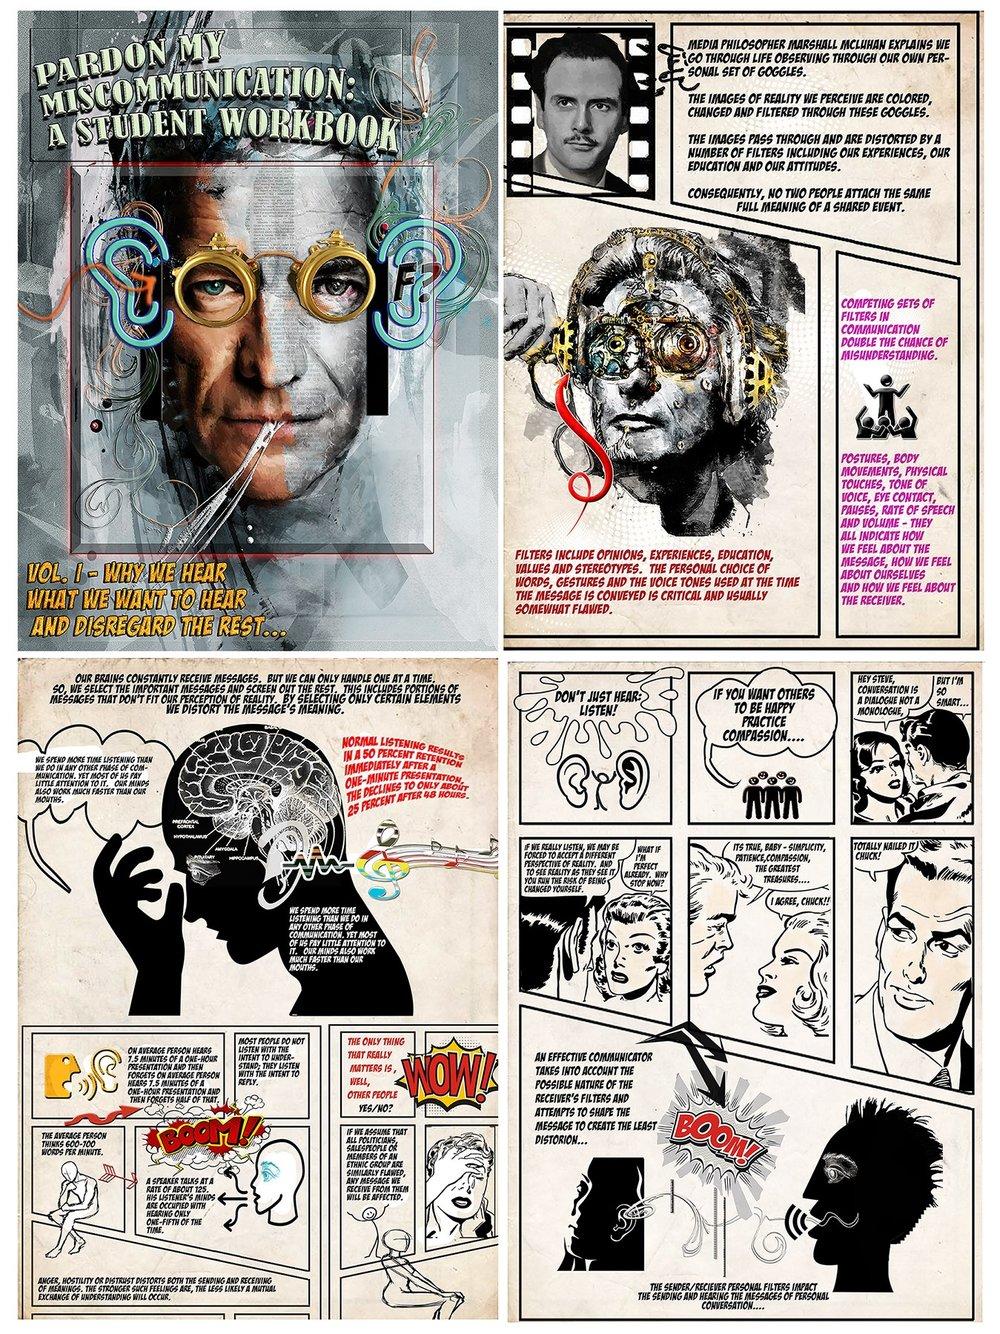 JOHN FIELDER.STUDENTWORKBOOK-PARDON MY MISCOMMUNICATION.DIGITAL GRAPHIC.20X24.jpg